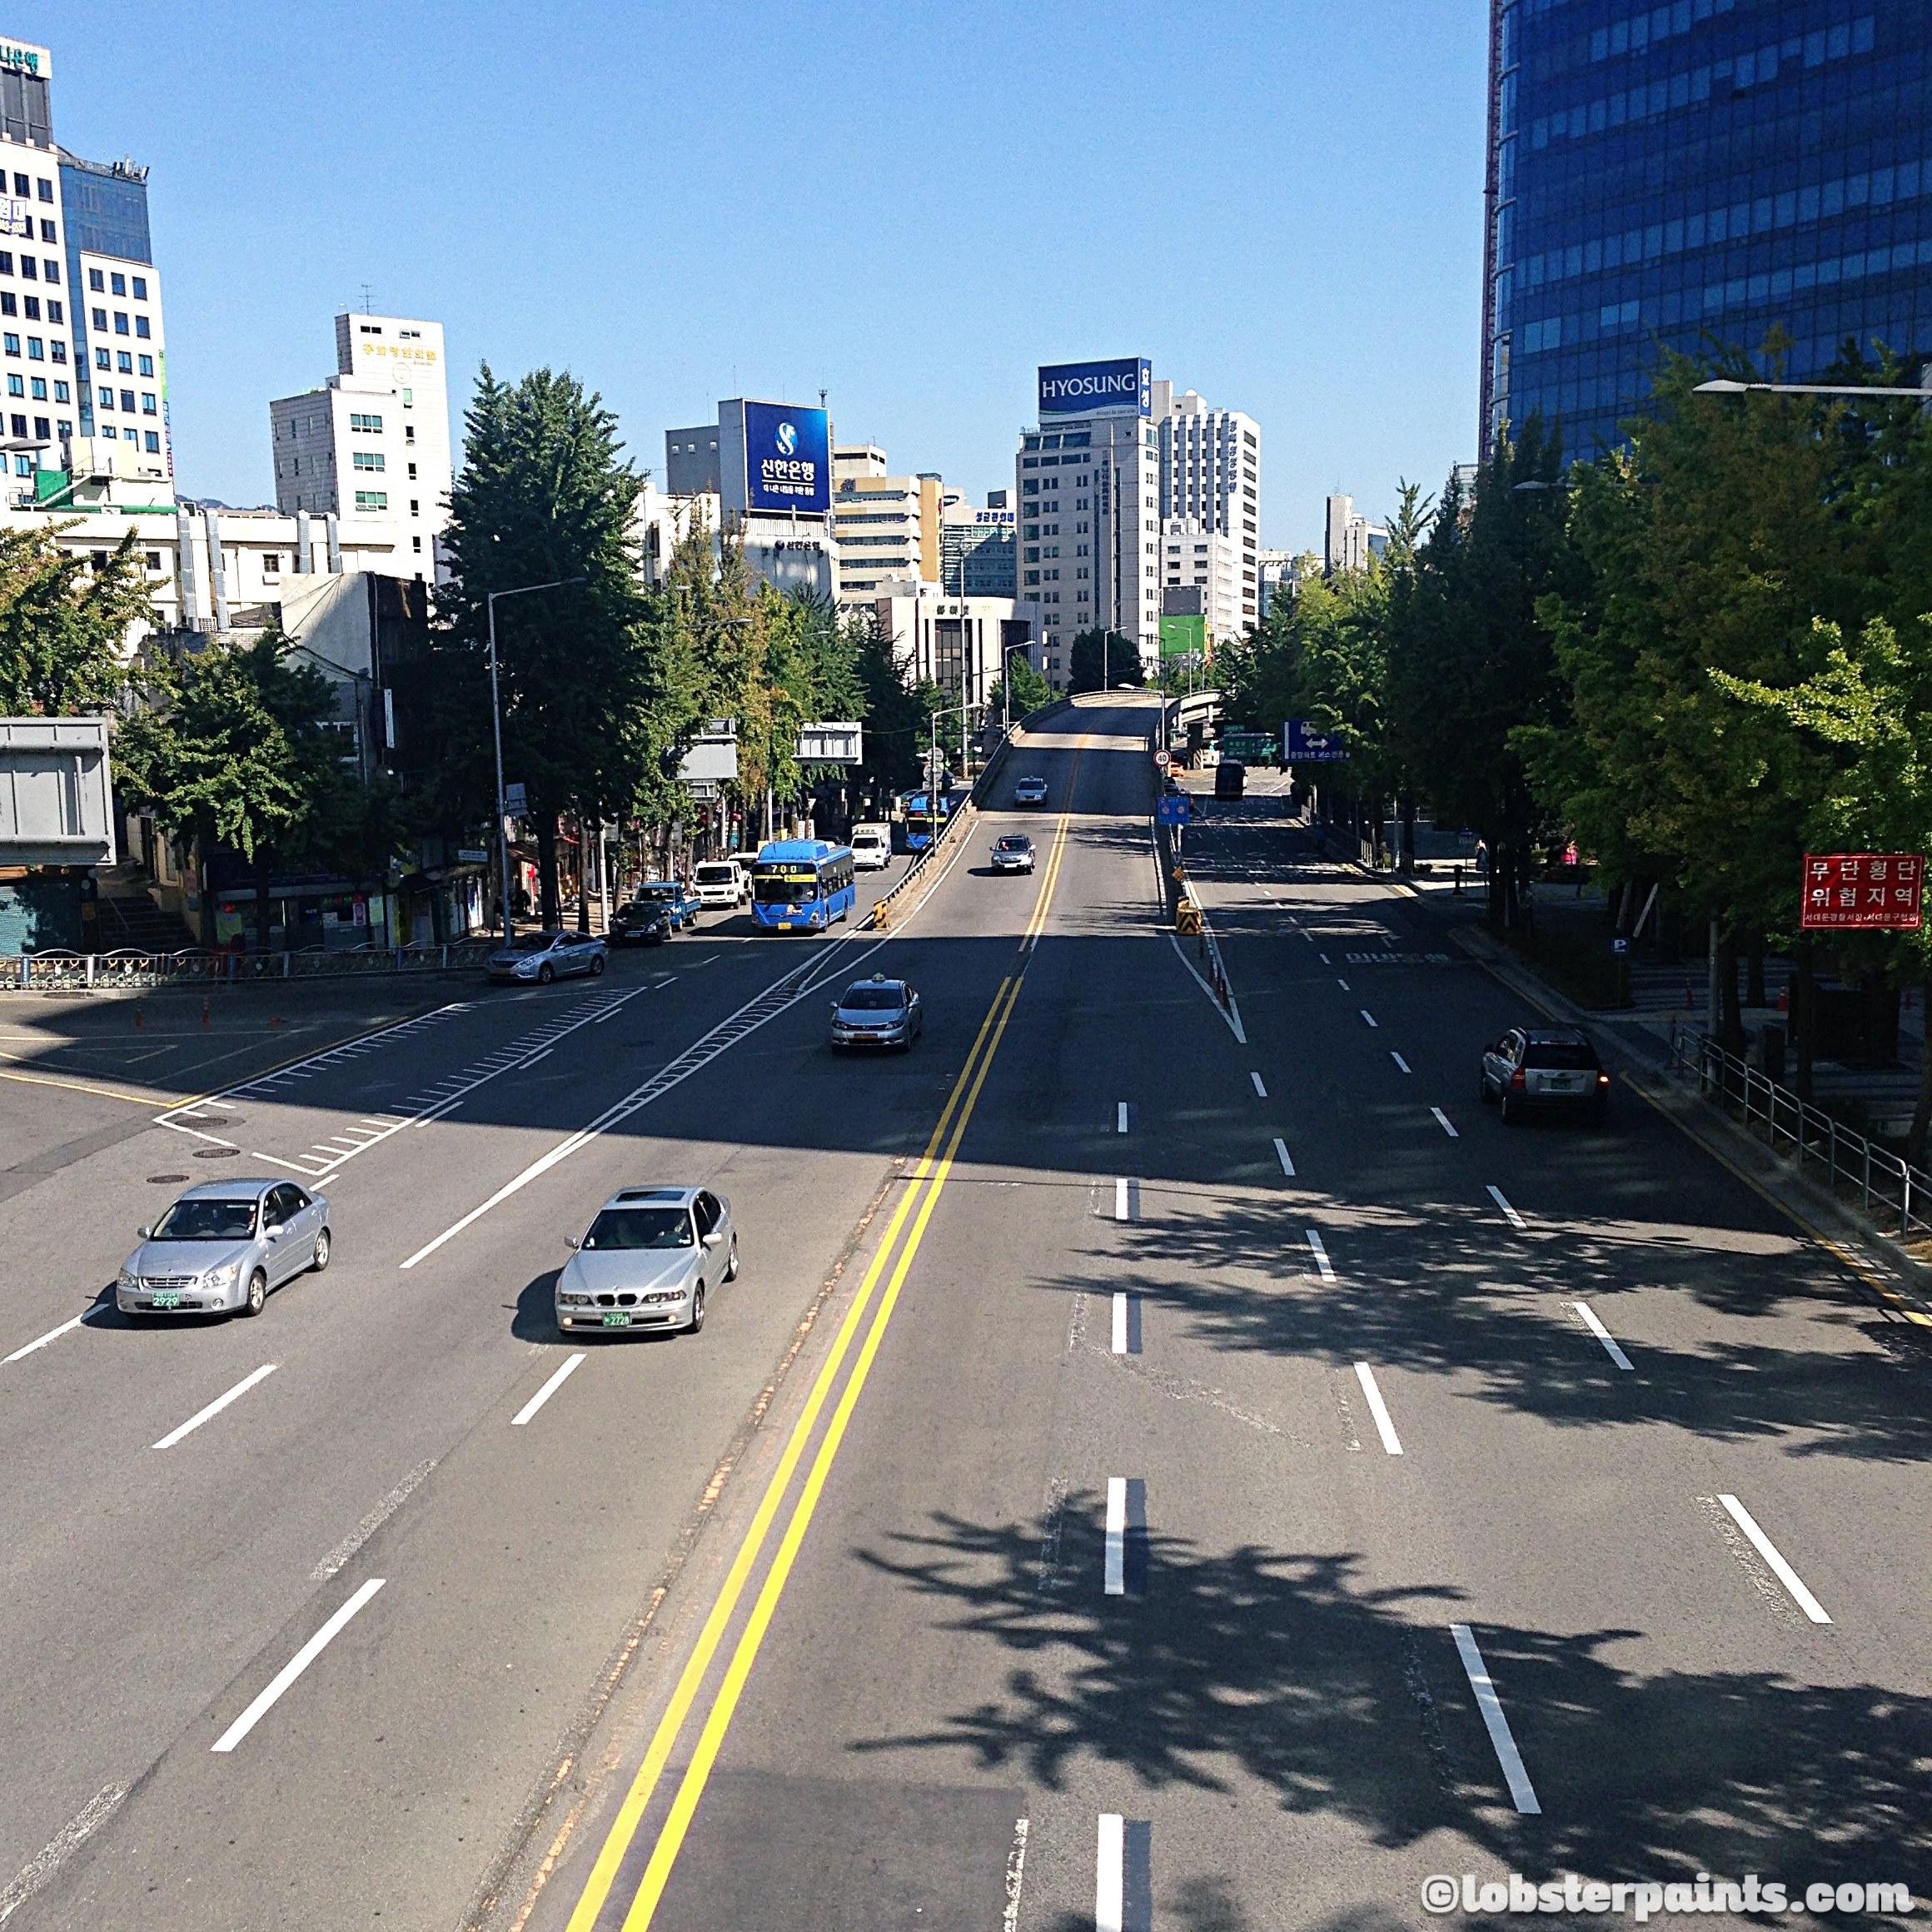 Chungjeongno/ Seodaemun Station | Seoul, South Korea